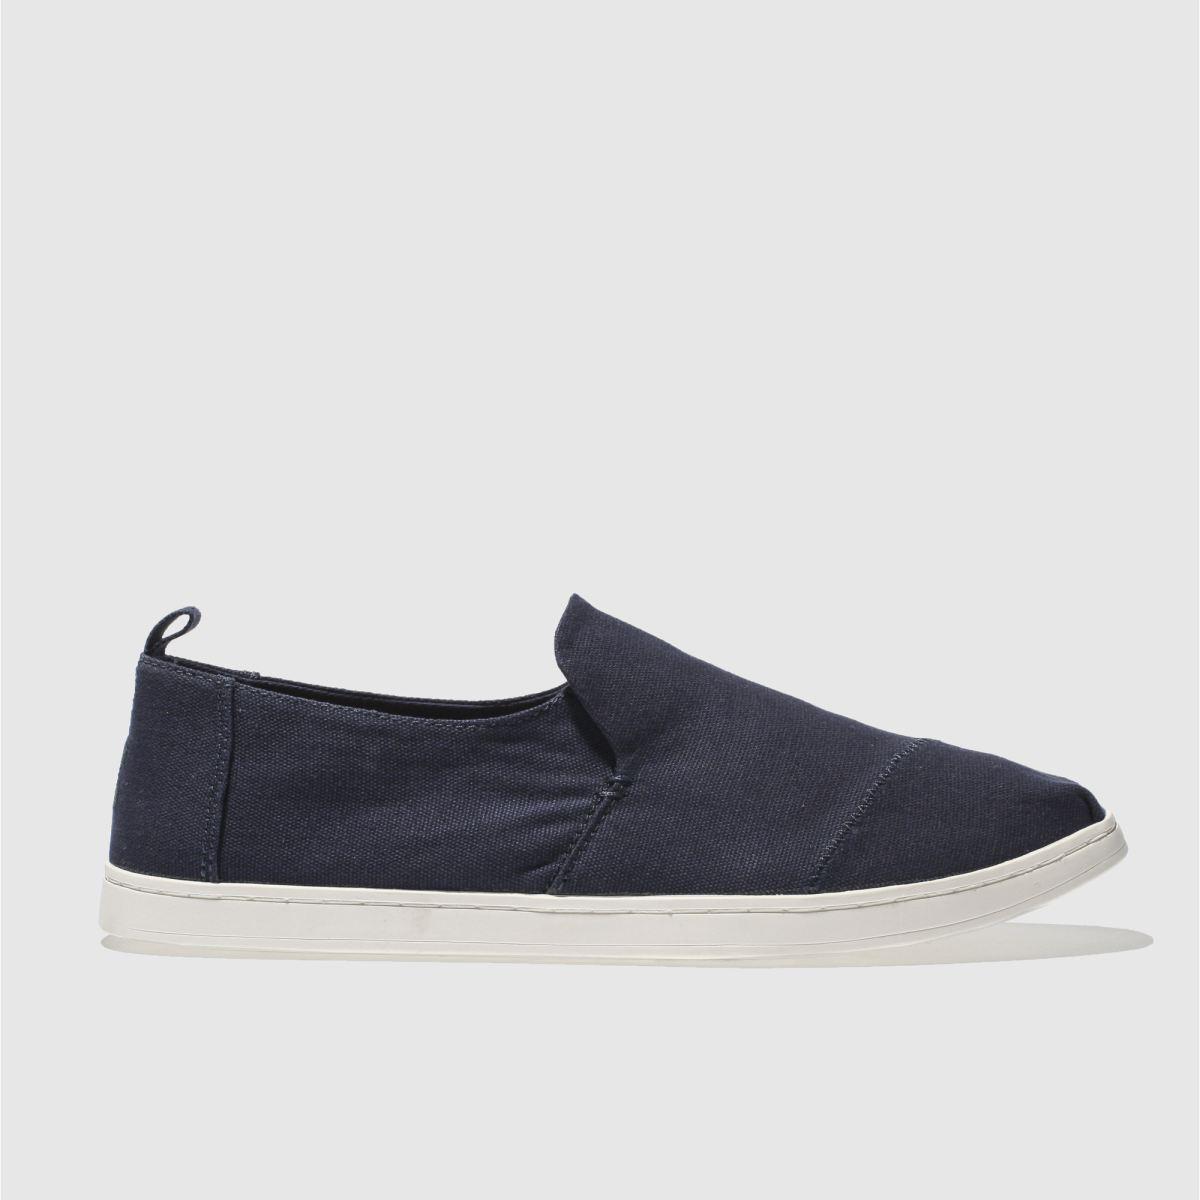 Toms Navy Deconstructed Alpargata Shoes